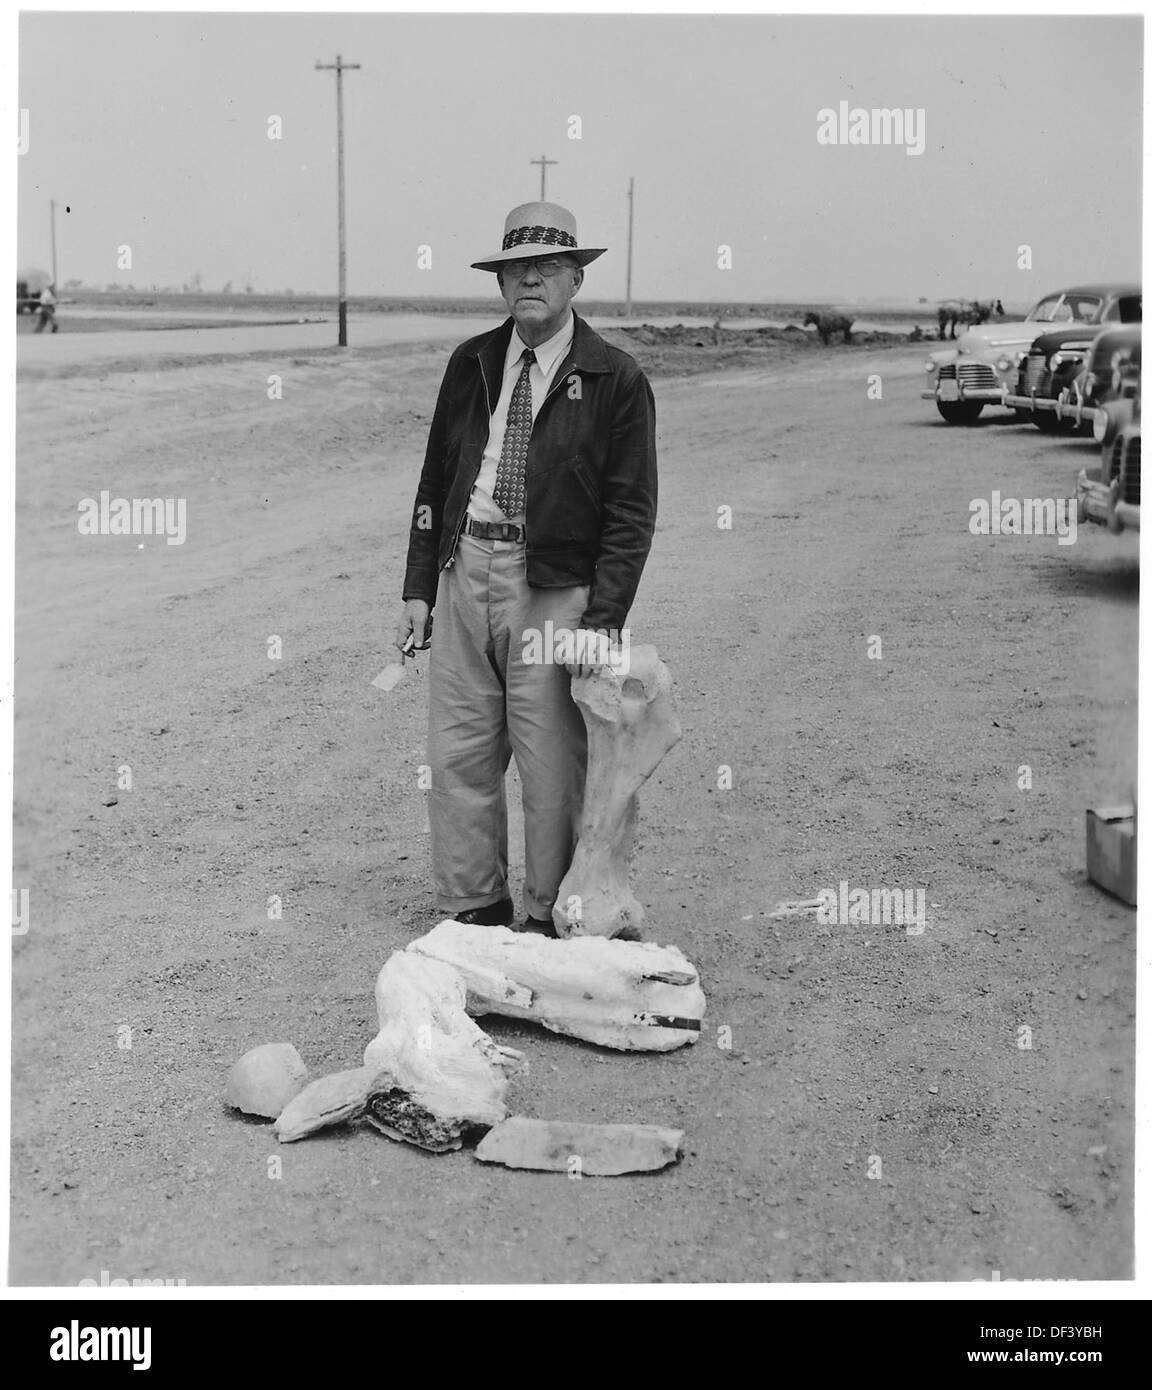 Dinosaur bones in parking lot. Cornhusker Ordnance Plant, Nebraska. 292133 - Stock Image